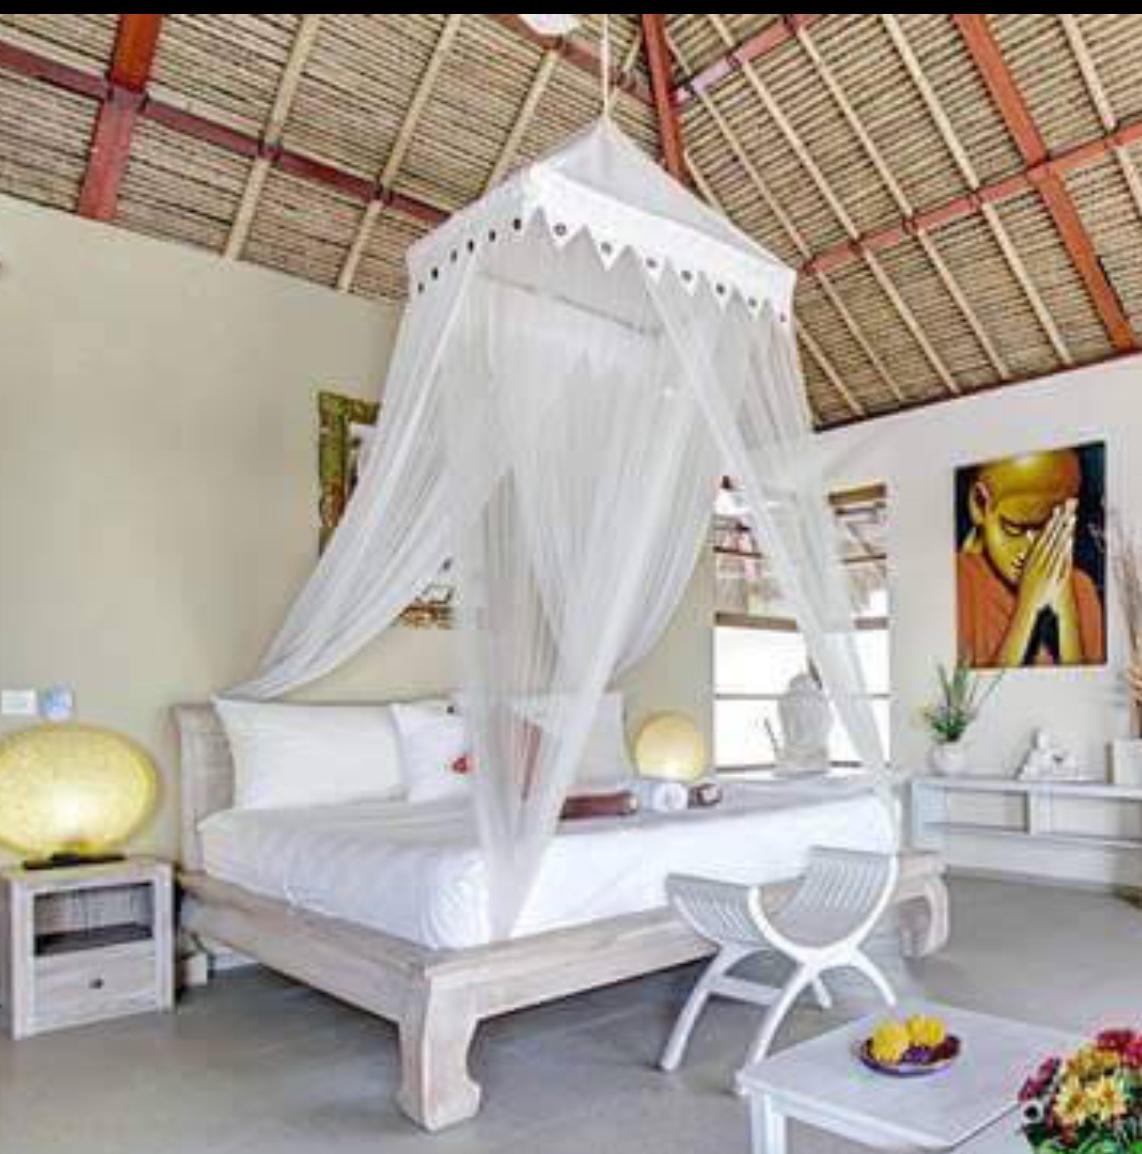 Bed Net Dbl Qn King Incl 80x80cm Rattan Hoop That Bali Shop